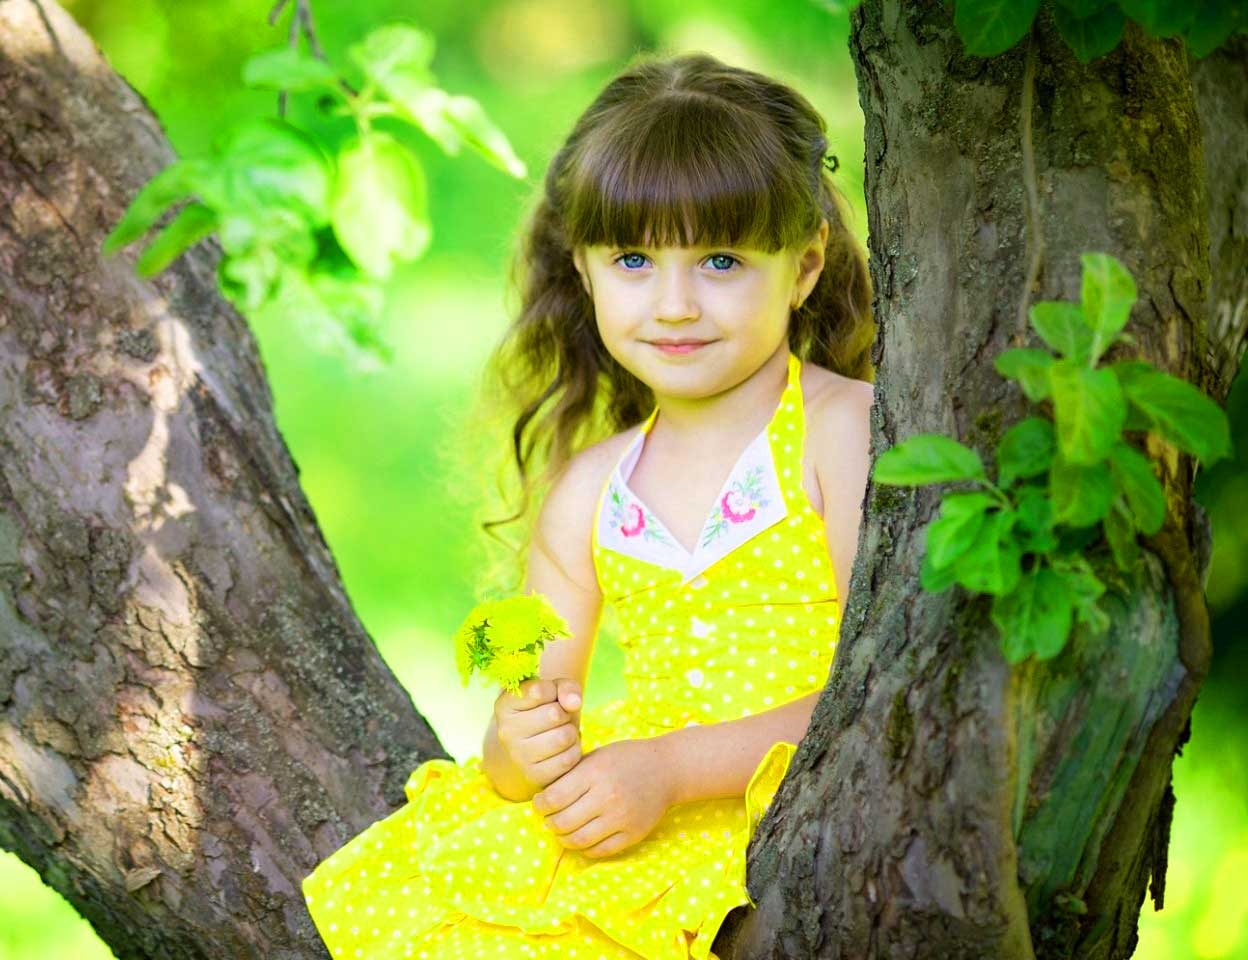 Free Very Beautiful Girl Images Wallpaper